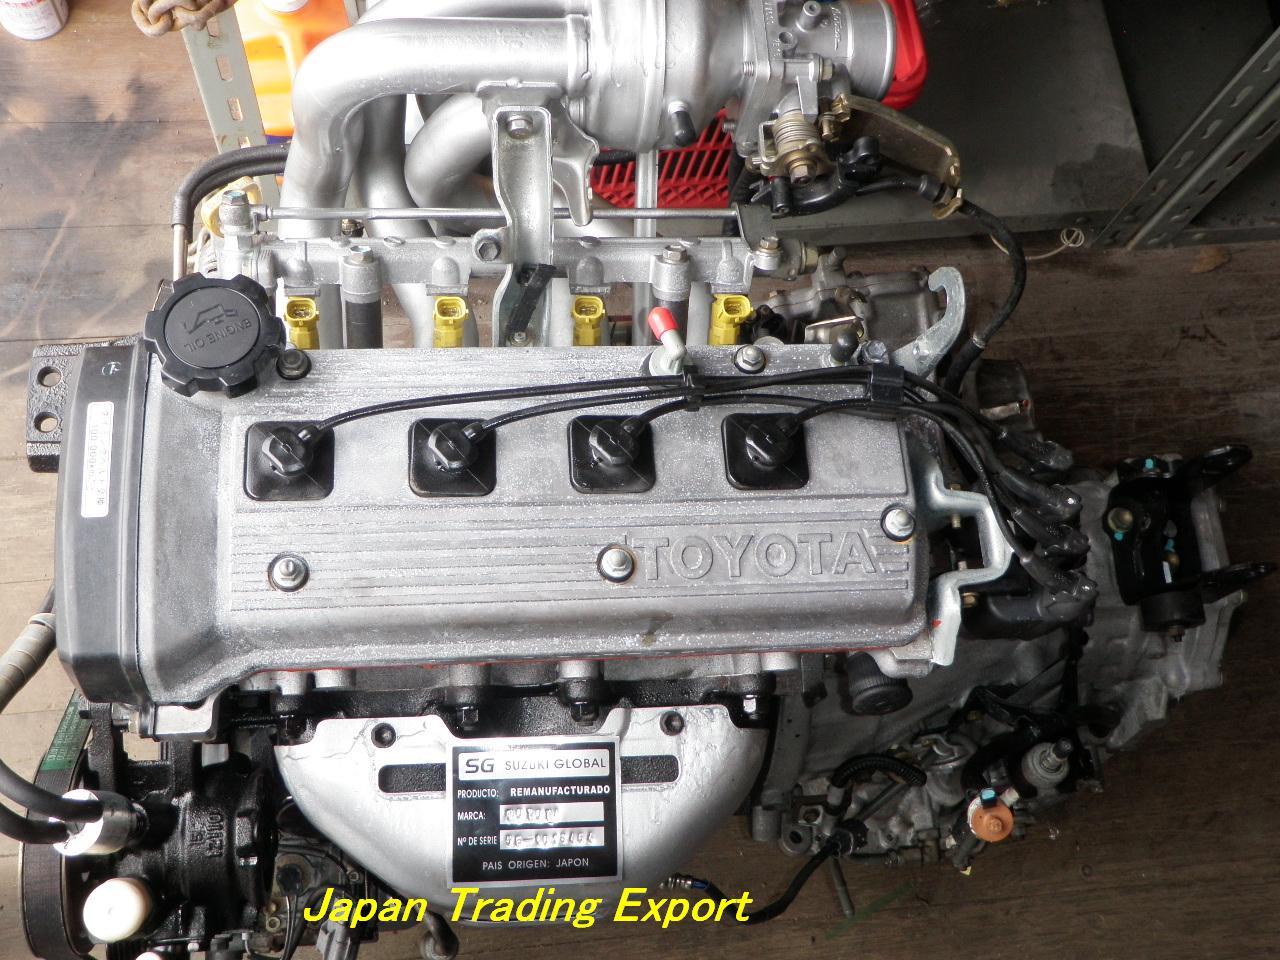 Motores  U0026 Transmisiones Japoneses Usados Standard  Toyota